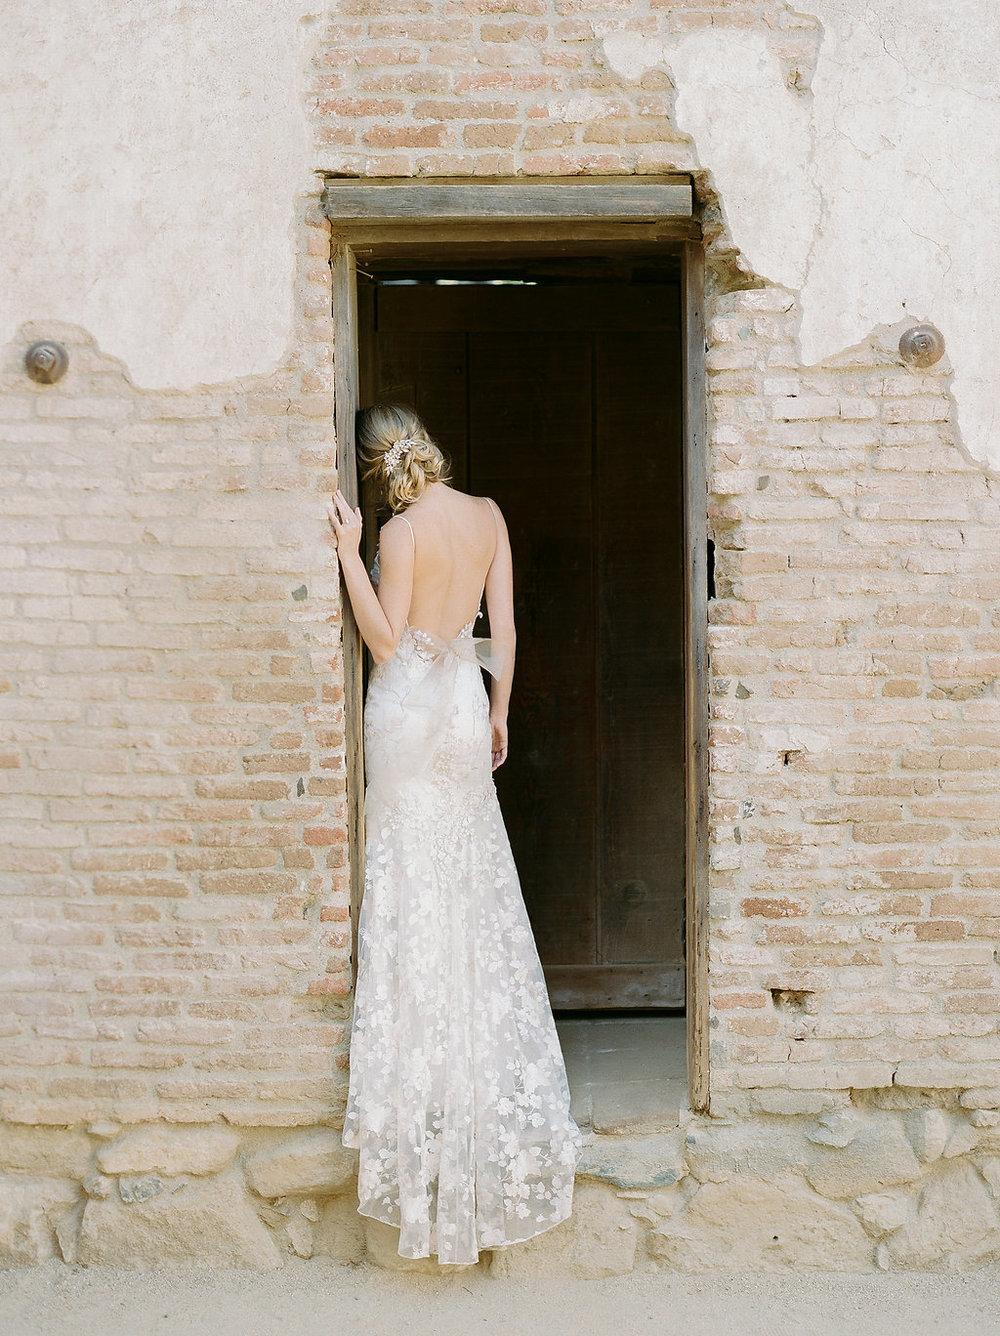 Spanish Mission Style Wedding Ideas Summer Flowers Finding Flora San Juan Capistrano European Venues California Claire Pettibone Wedding Dress Bridal Hair